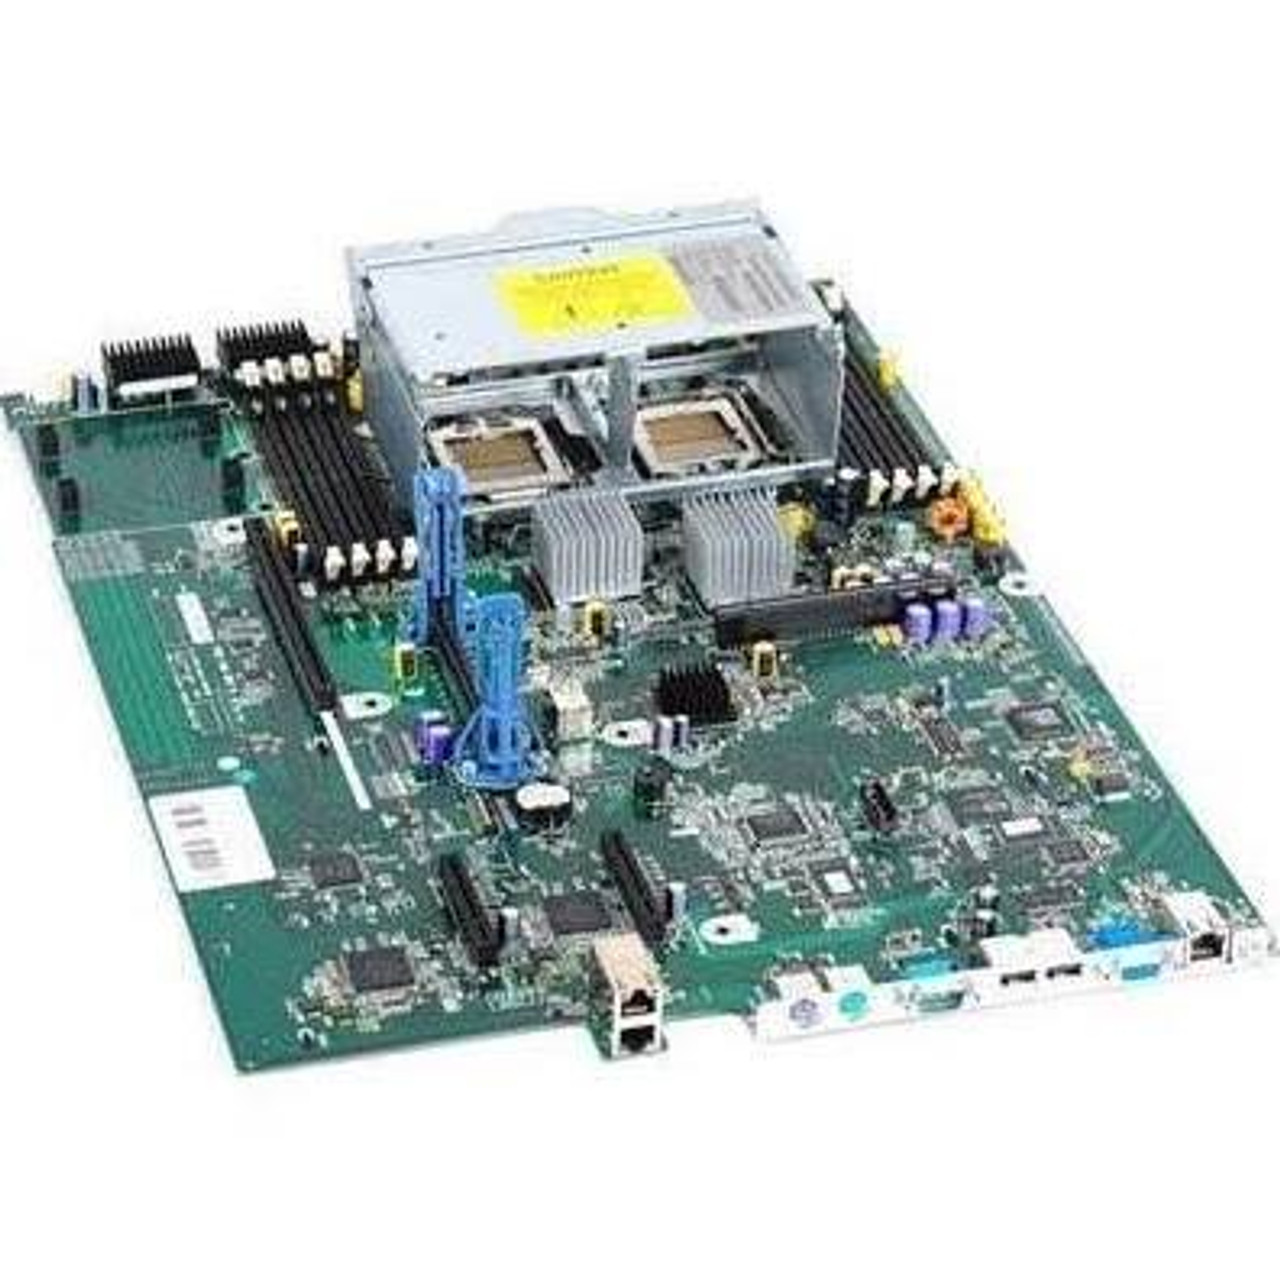 671349-001 HPE HEASTSINK CPU 2 COPPER FOR SL250S SL270S SL230S G8